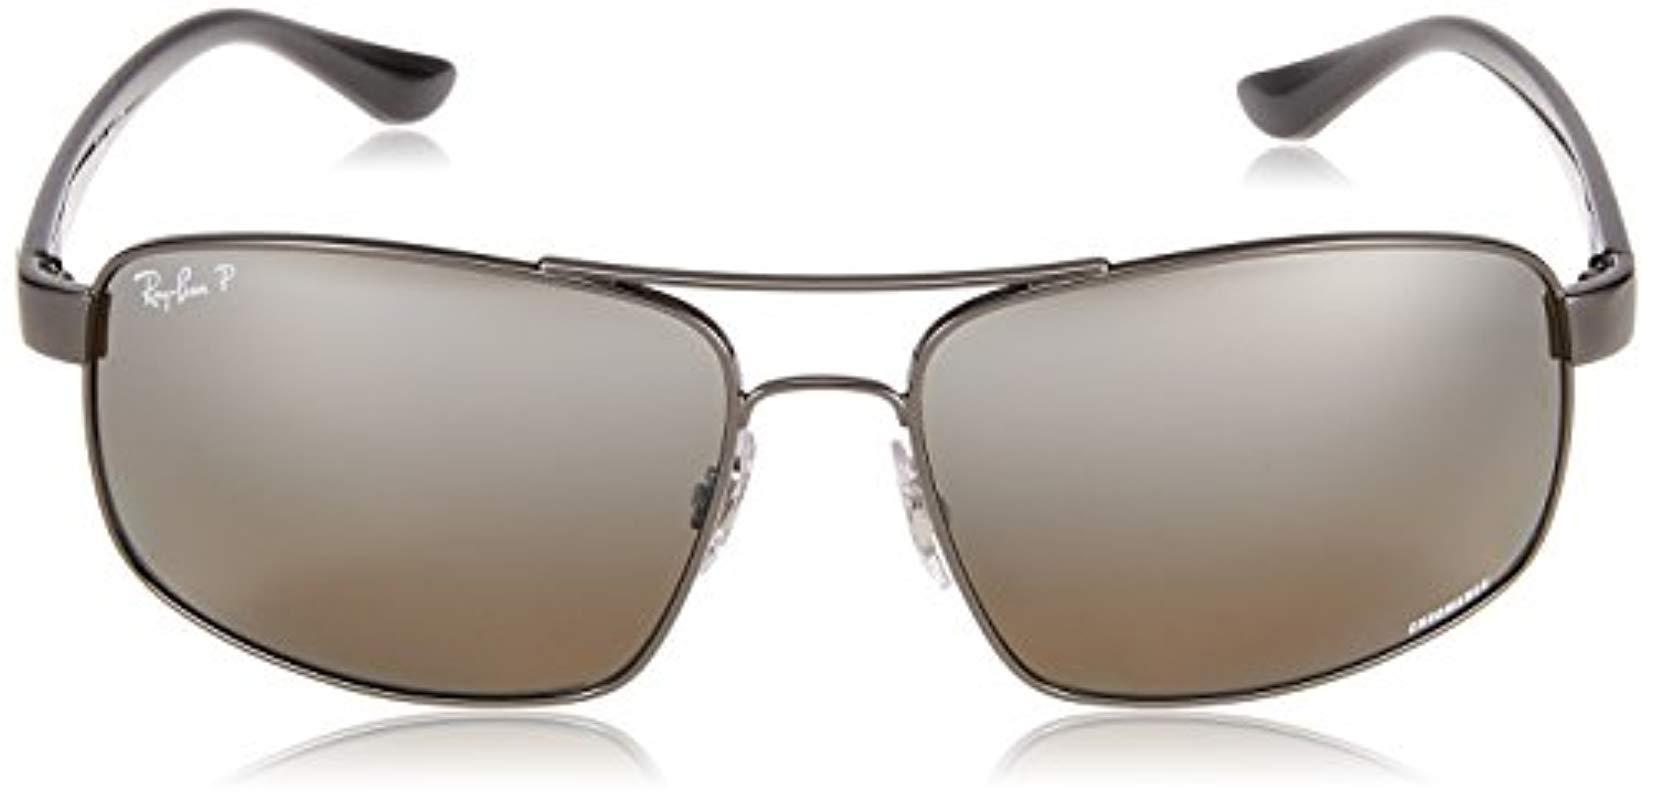 1ba7f5a7549 Ray-Ban - Gray Rb3604ch 62 Sunglasses 62mm for Men - Lyst. View fullscreen